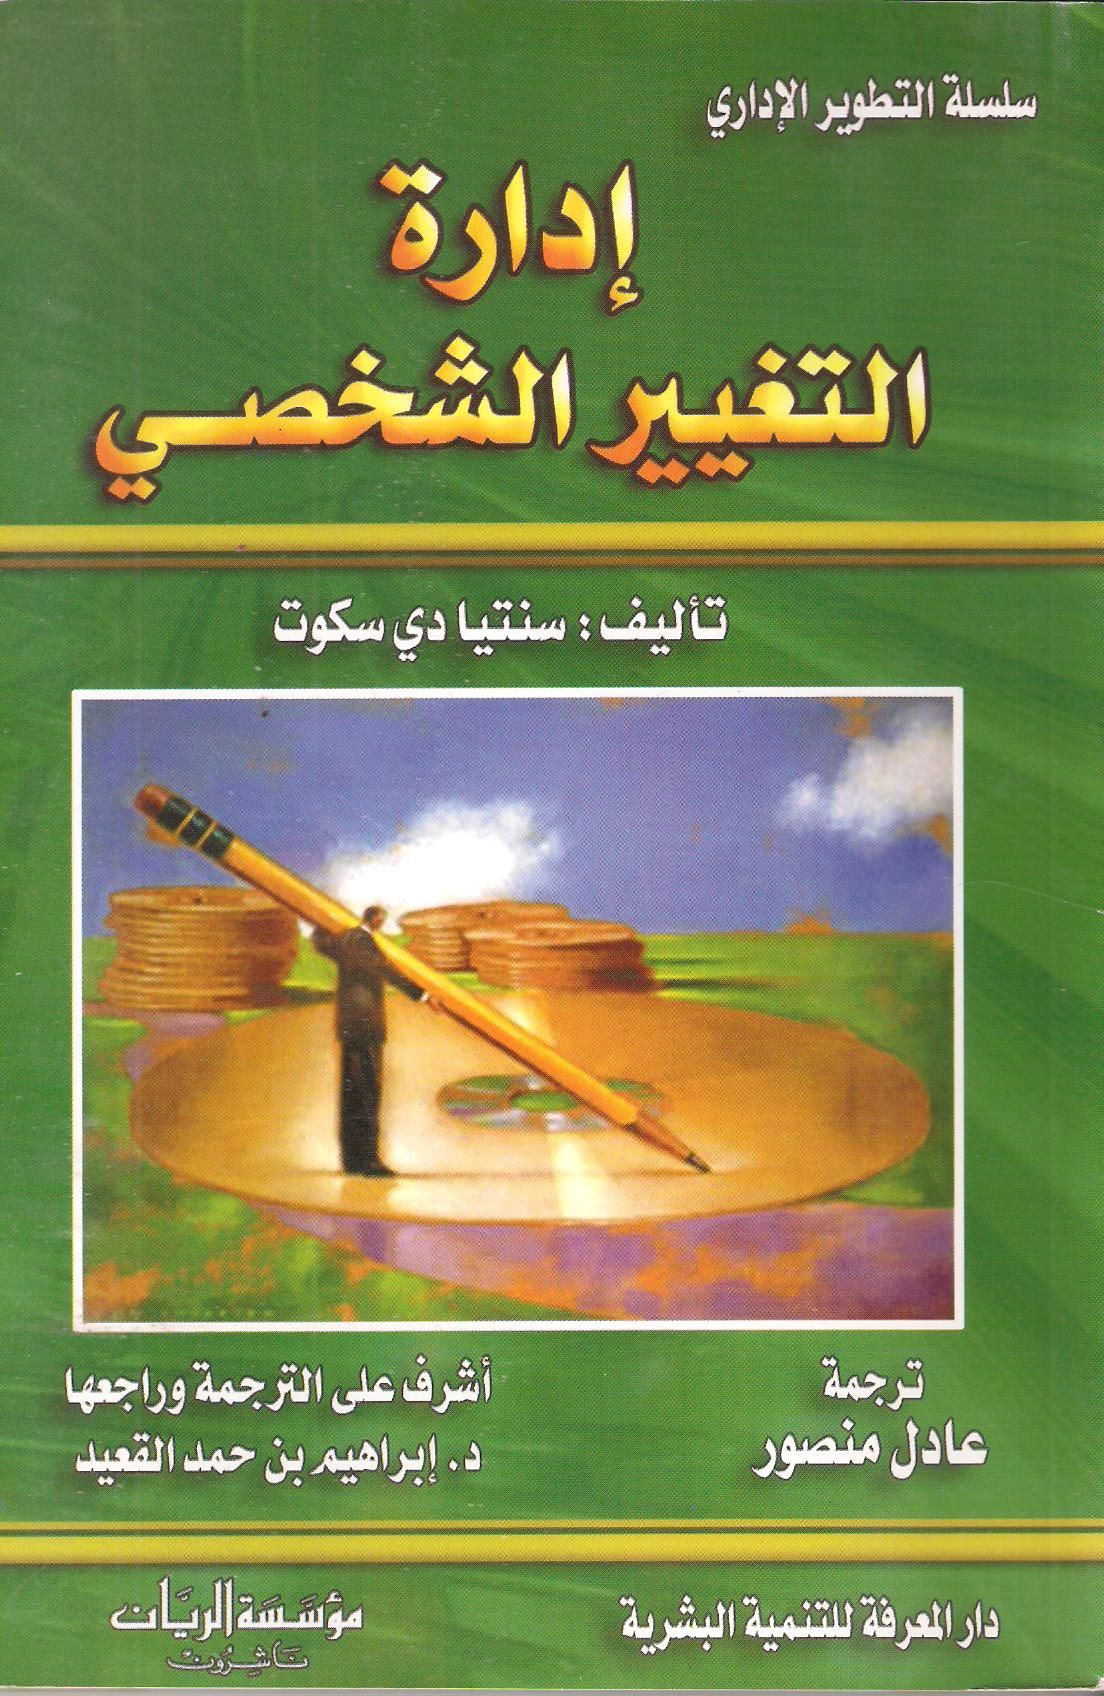 ادارة التغيير الشخصي Chapter Books Pdf Books Reading Book Qoutes